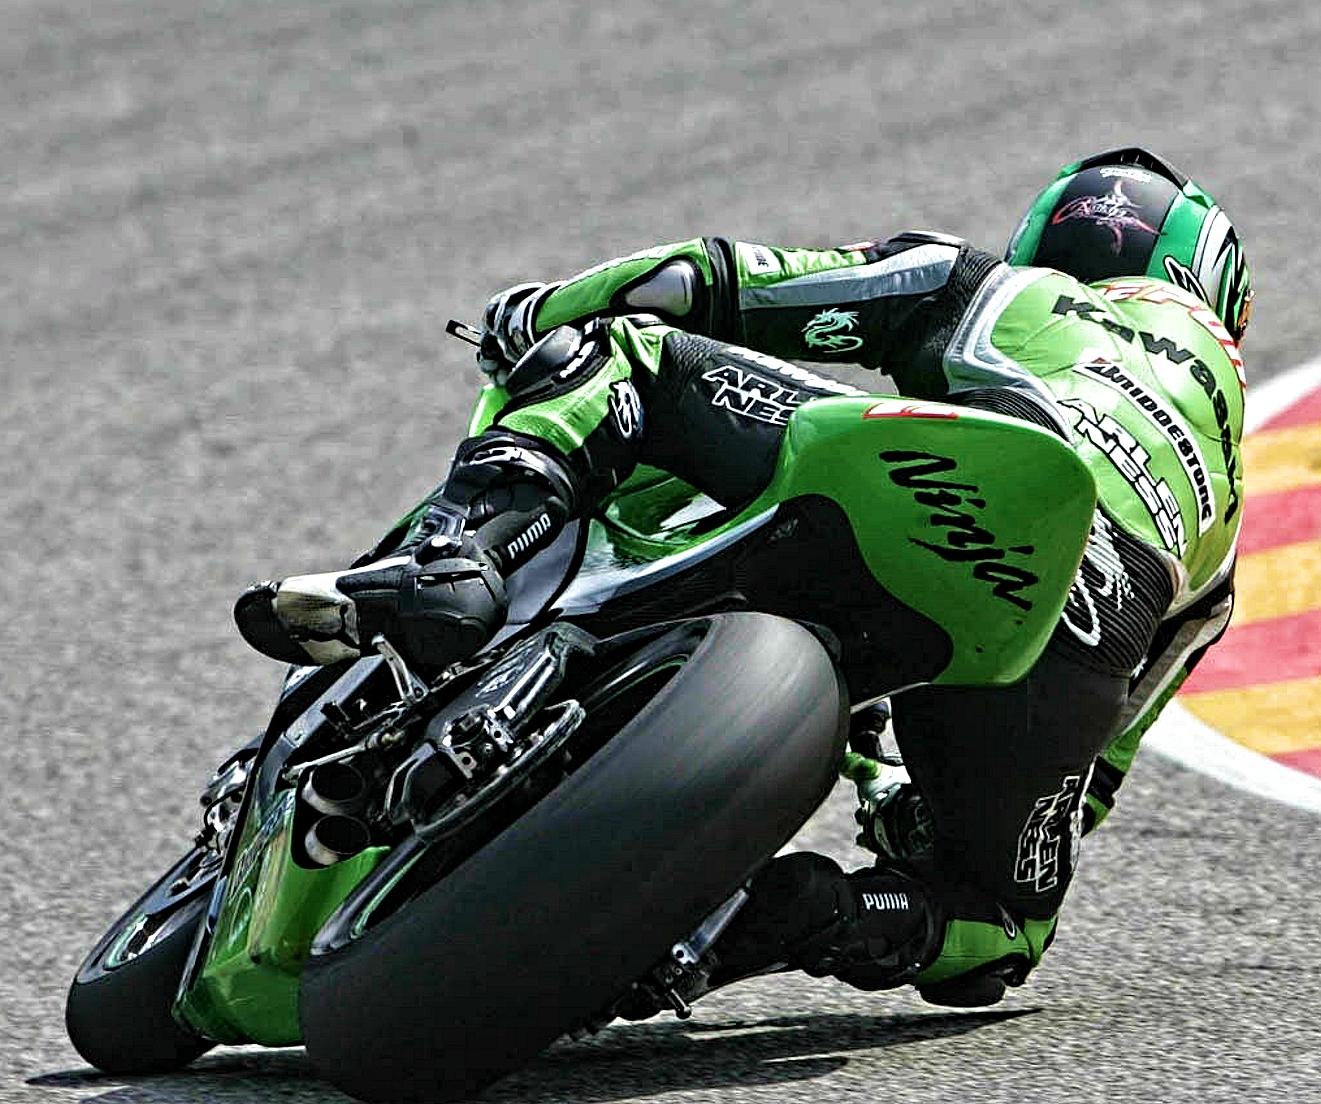 Wallpaper : Honda, KTM, Triumph, Motorcycle, Yamaha